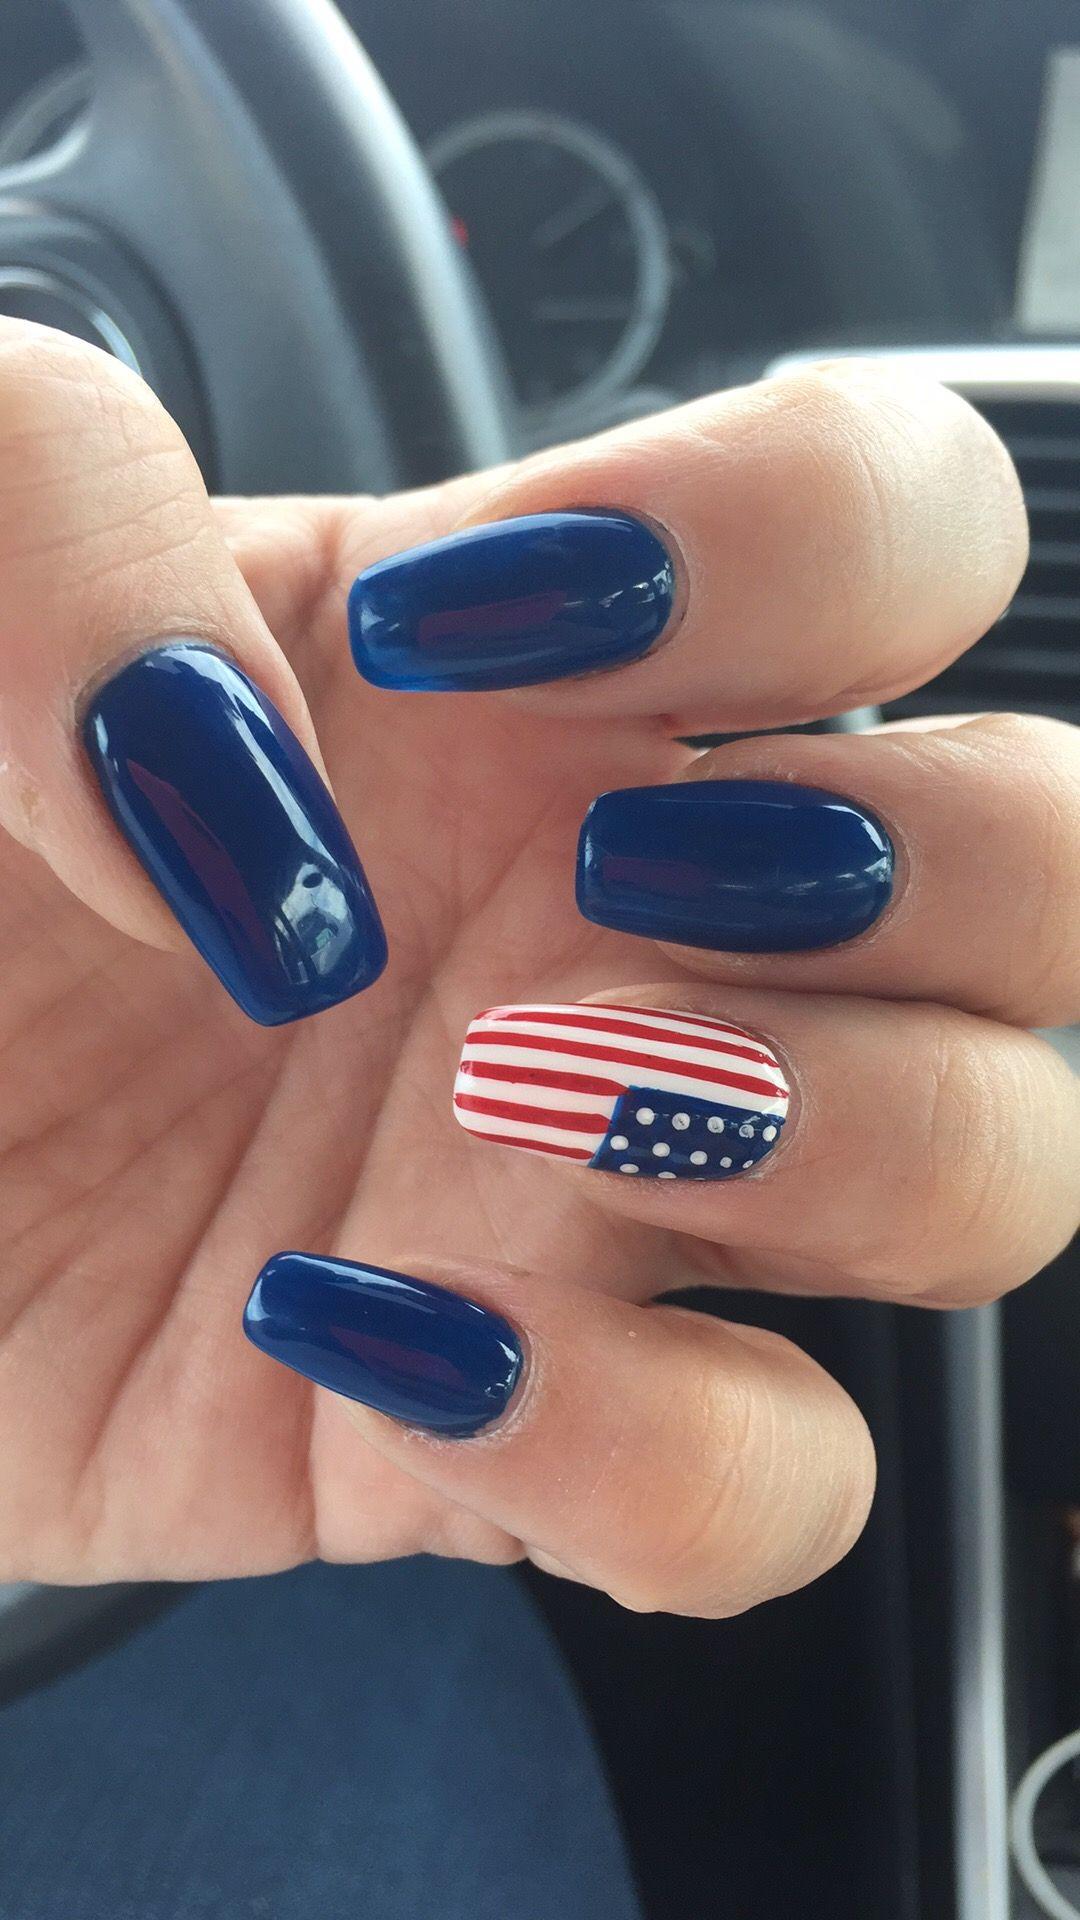 6 Fourth Of July Nail Designs Woman Fashion Nicepricesell Com Fourth Of July Nails 4th Of July Nails Patriotic Nails